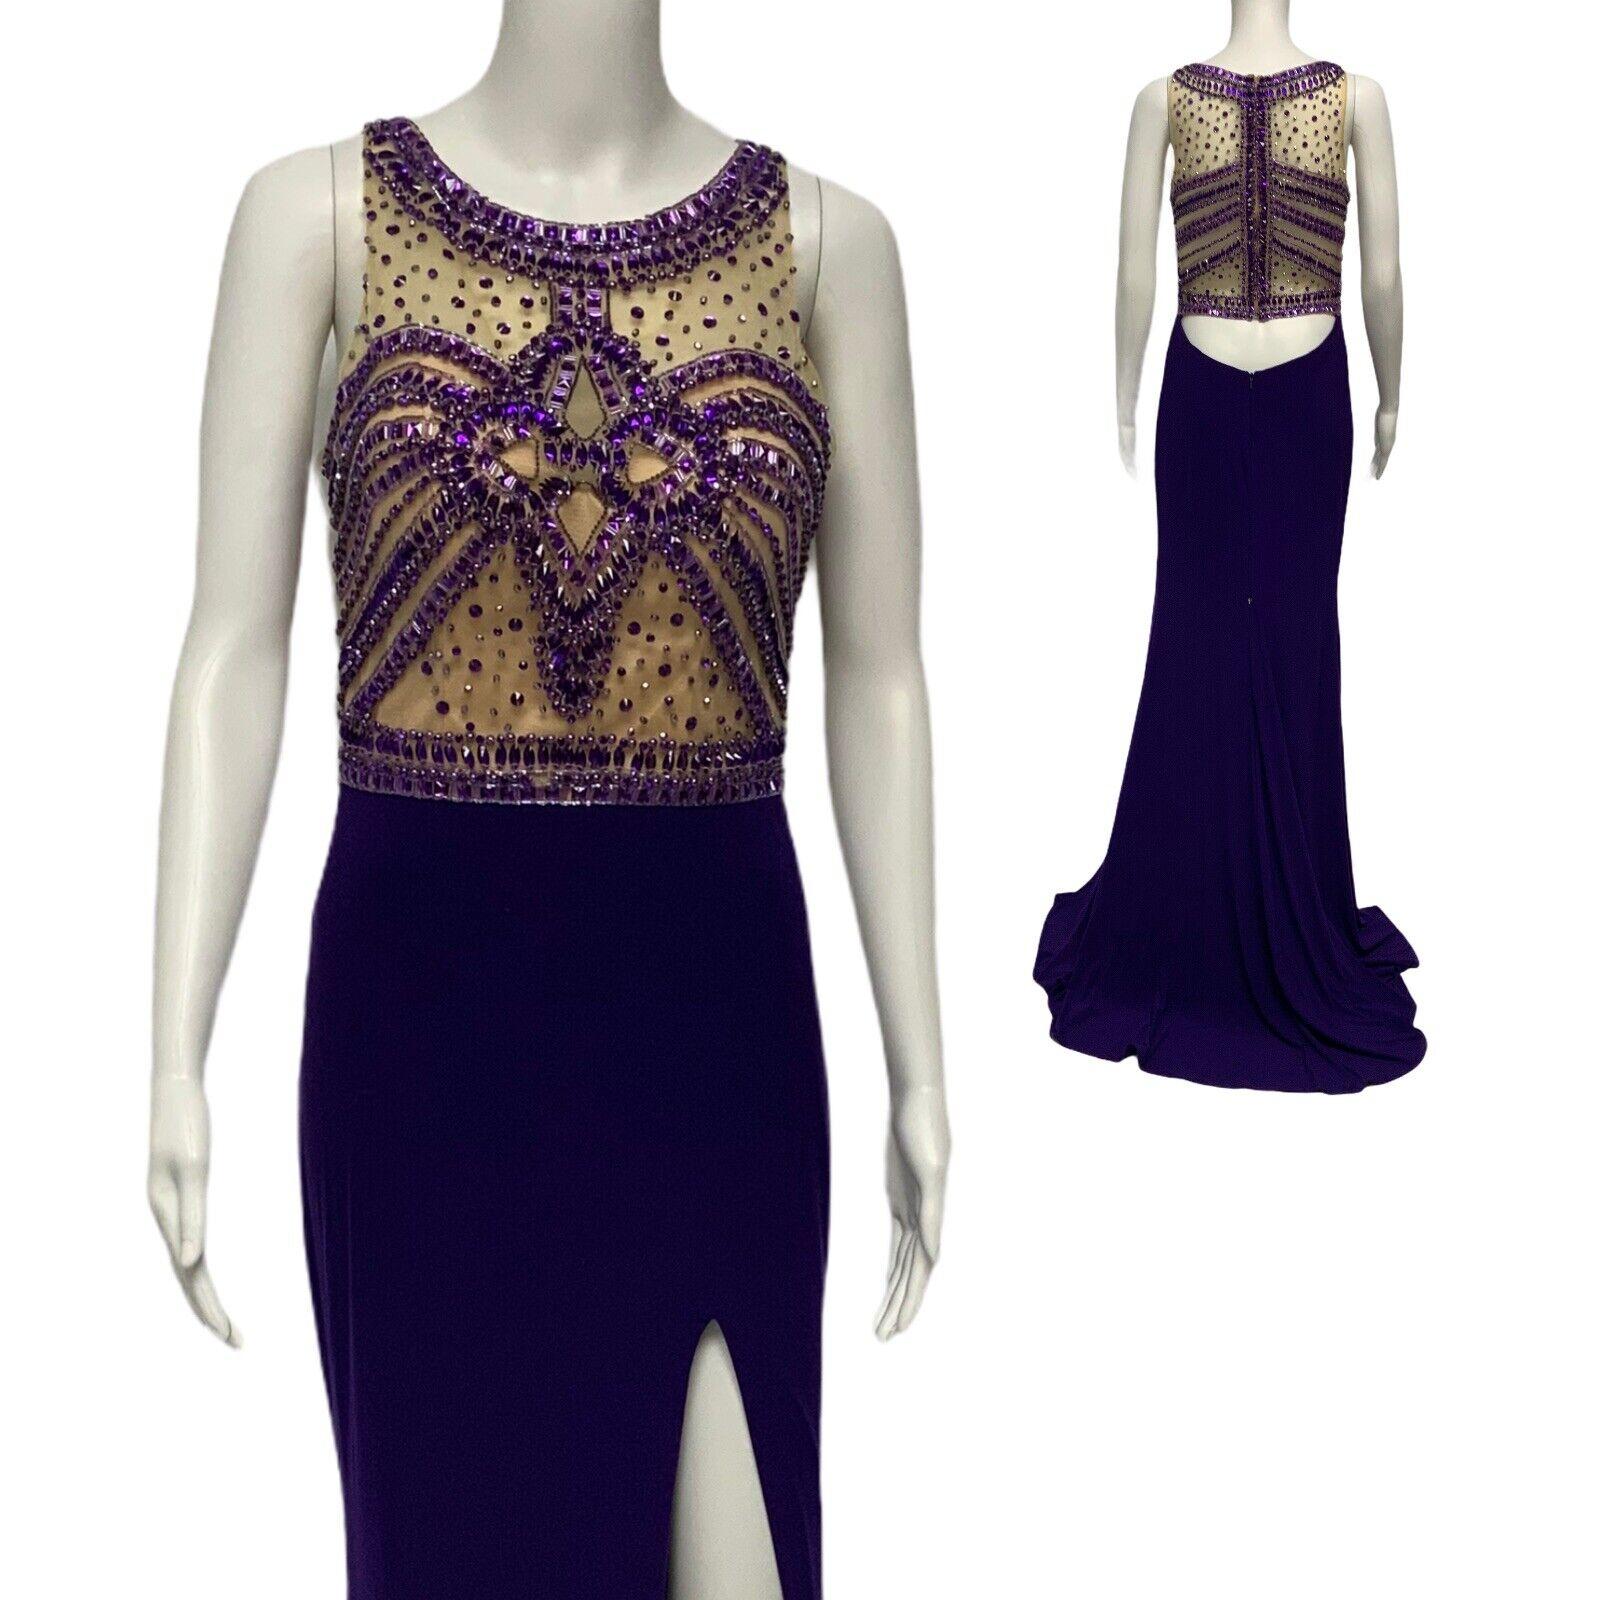 MORILEE by Madeline Gardner evening formal long dress purple size 5/6